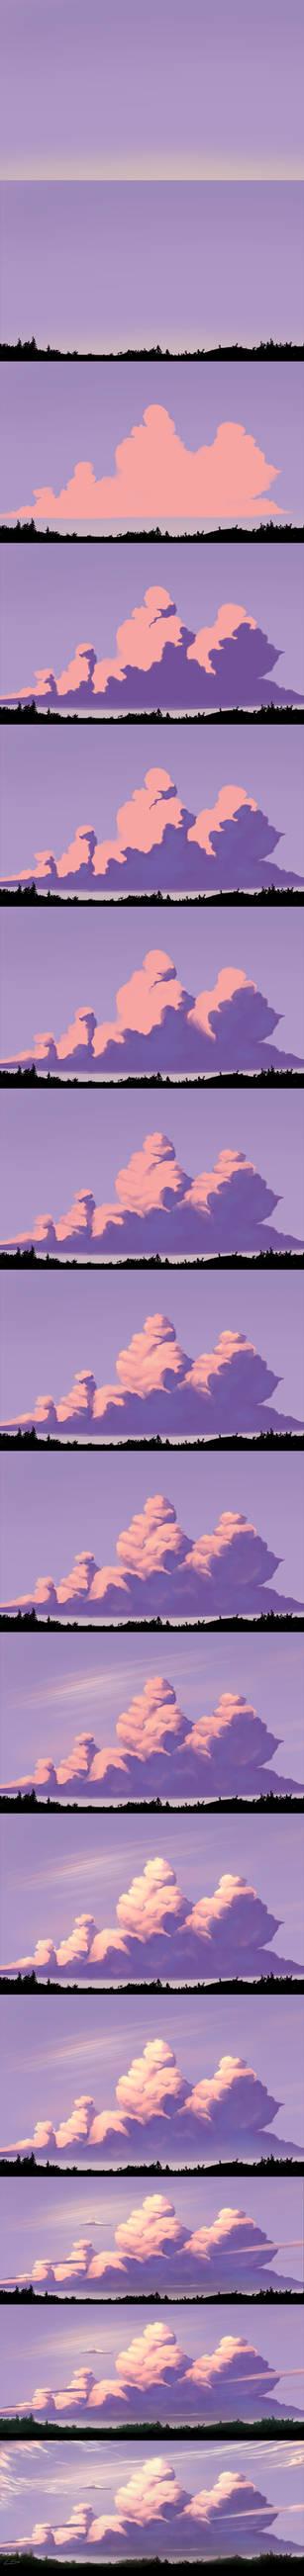 Evening Sky - Step by Step